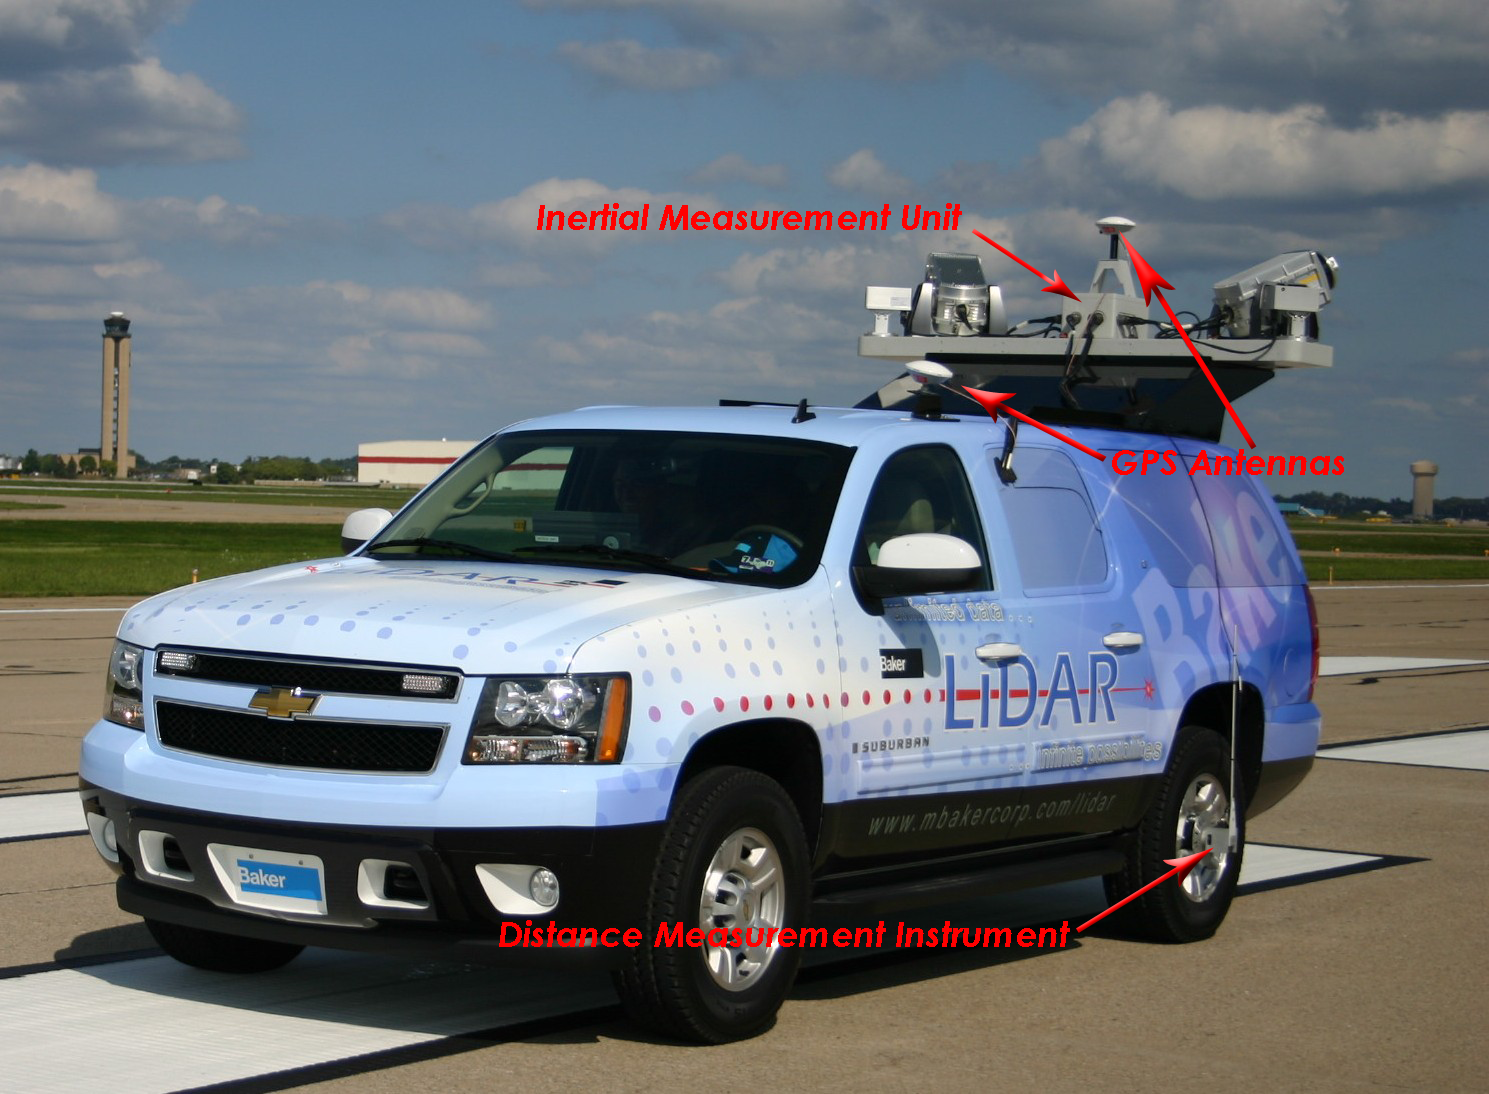 Mobile LiDAR Mapping - Huron Geomatics Inc.